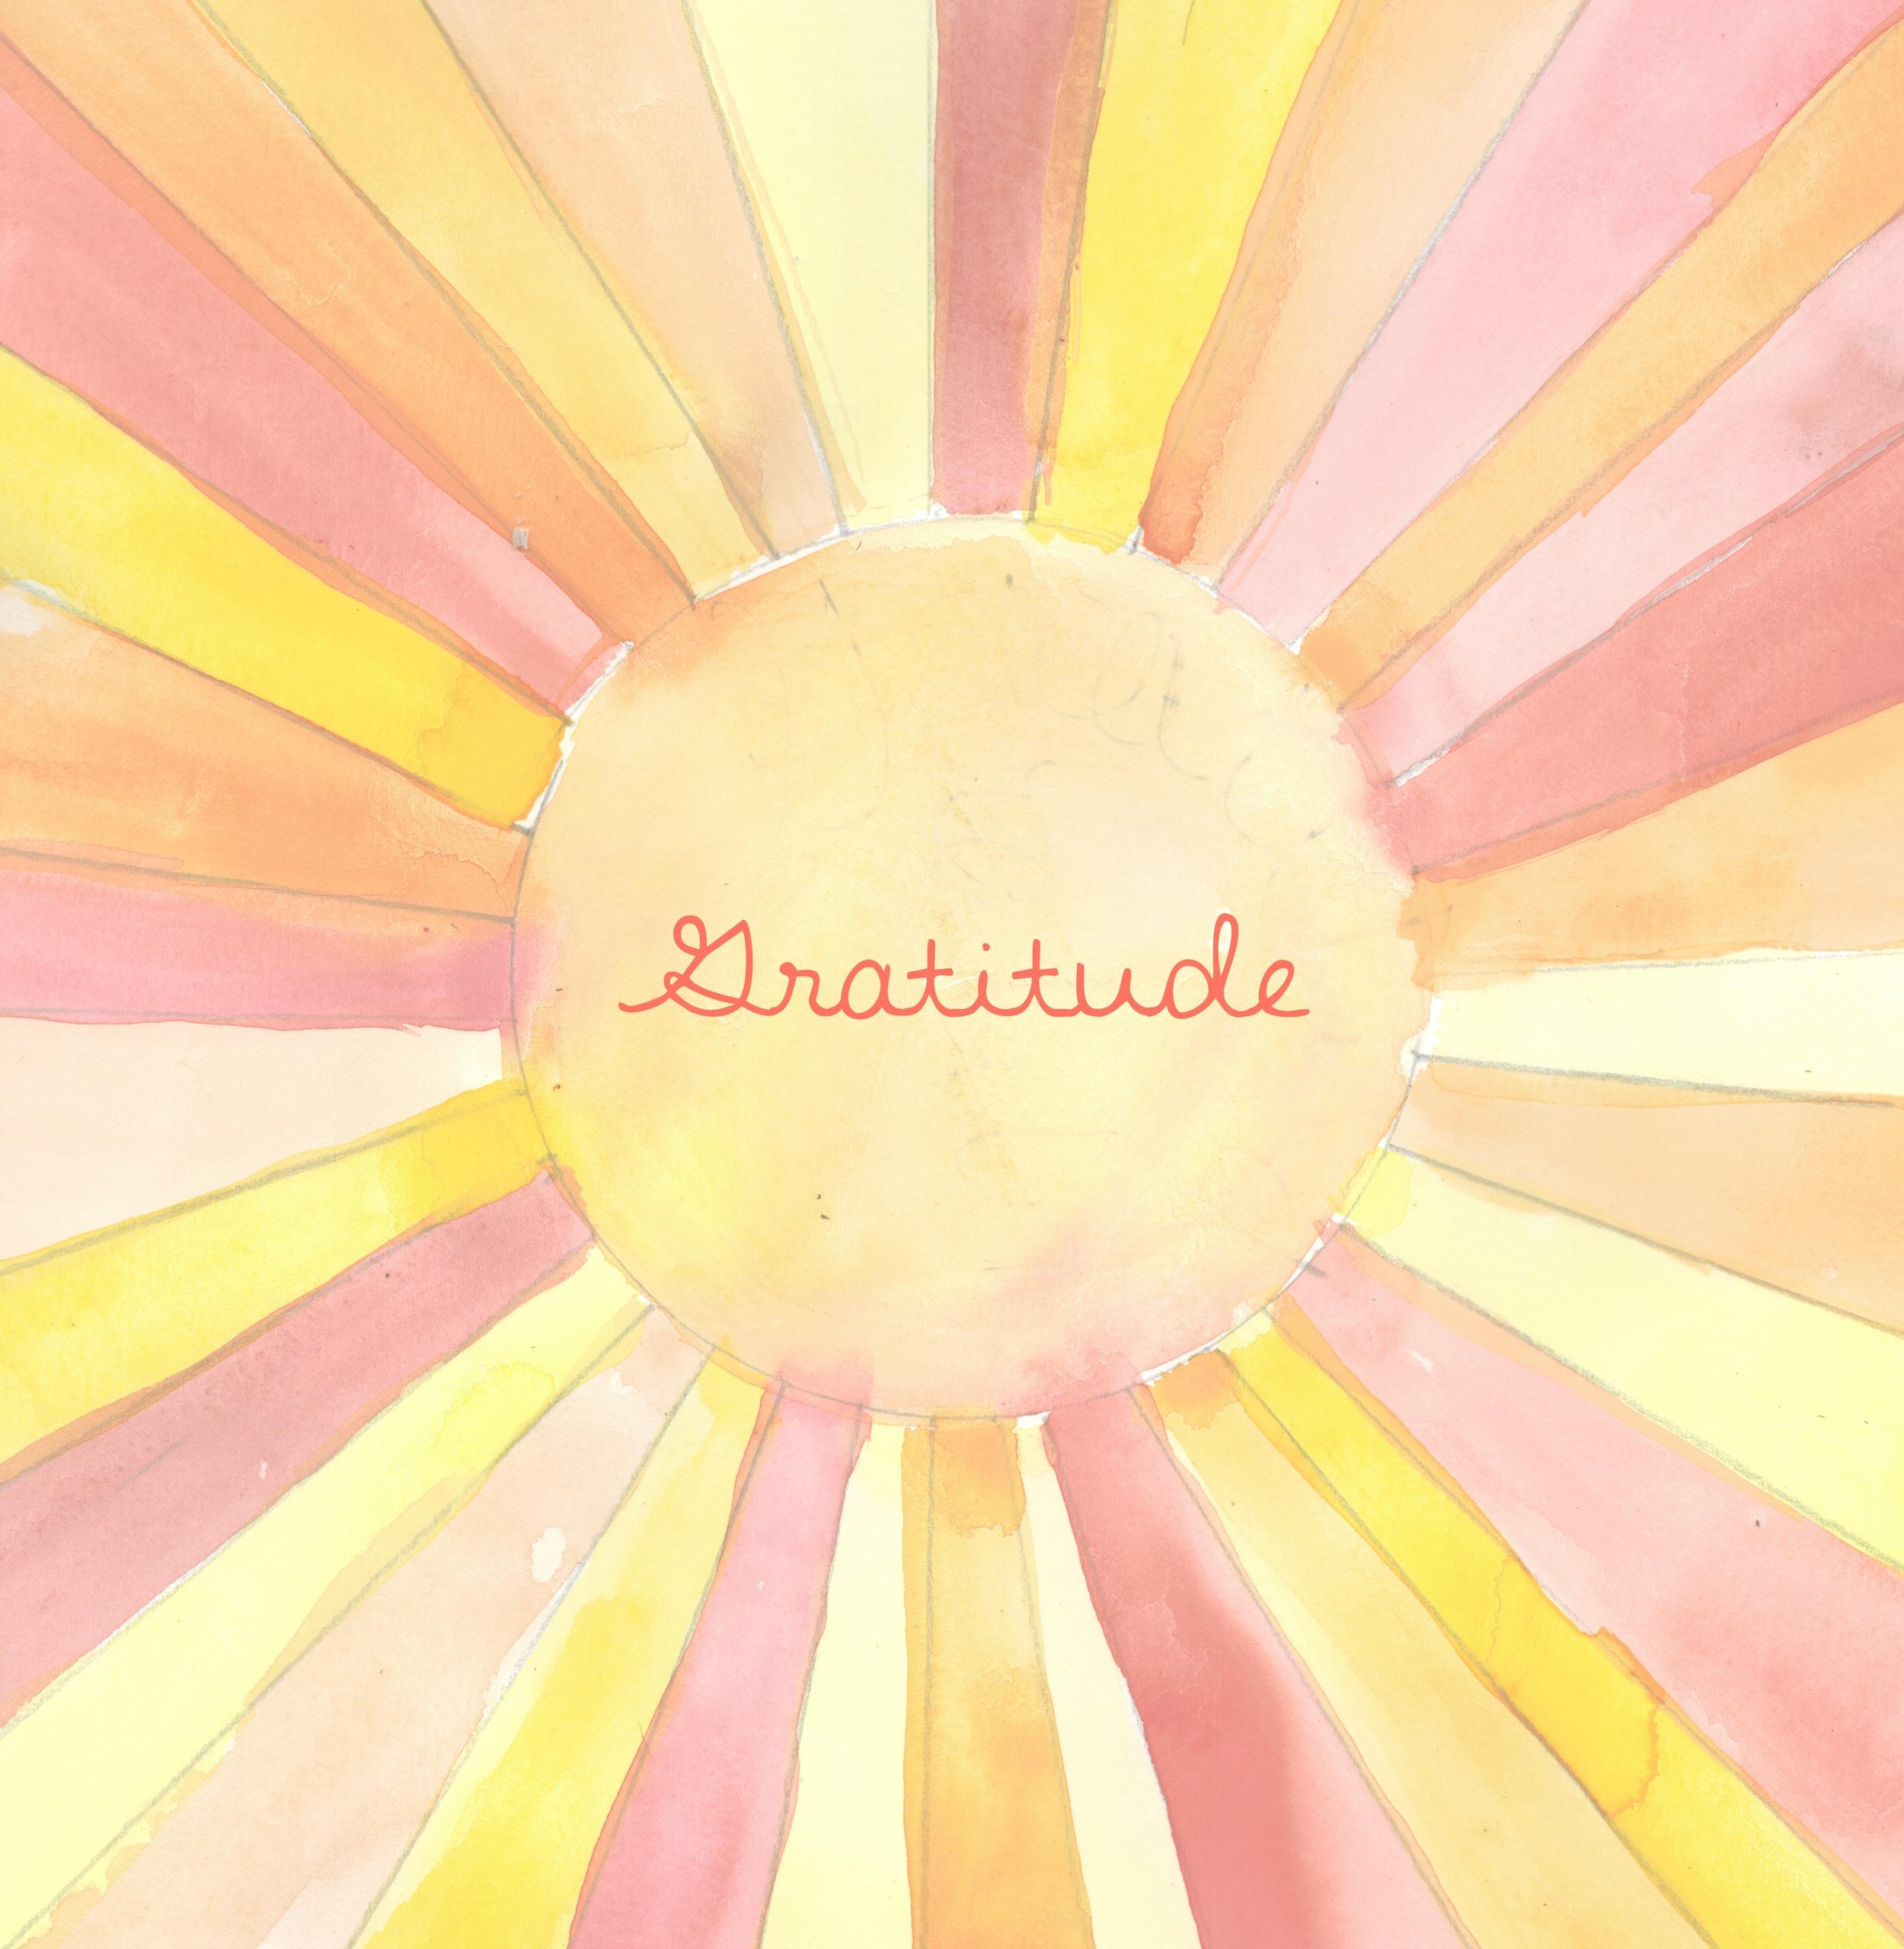 Click on this image to get your free printable gratitude mandala.